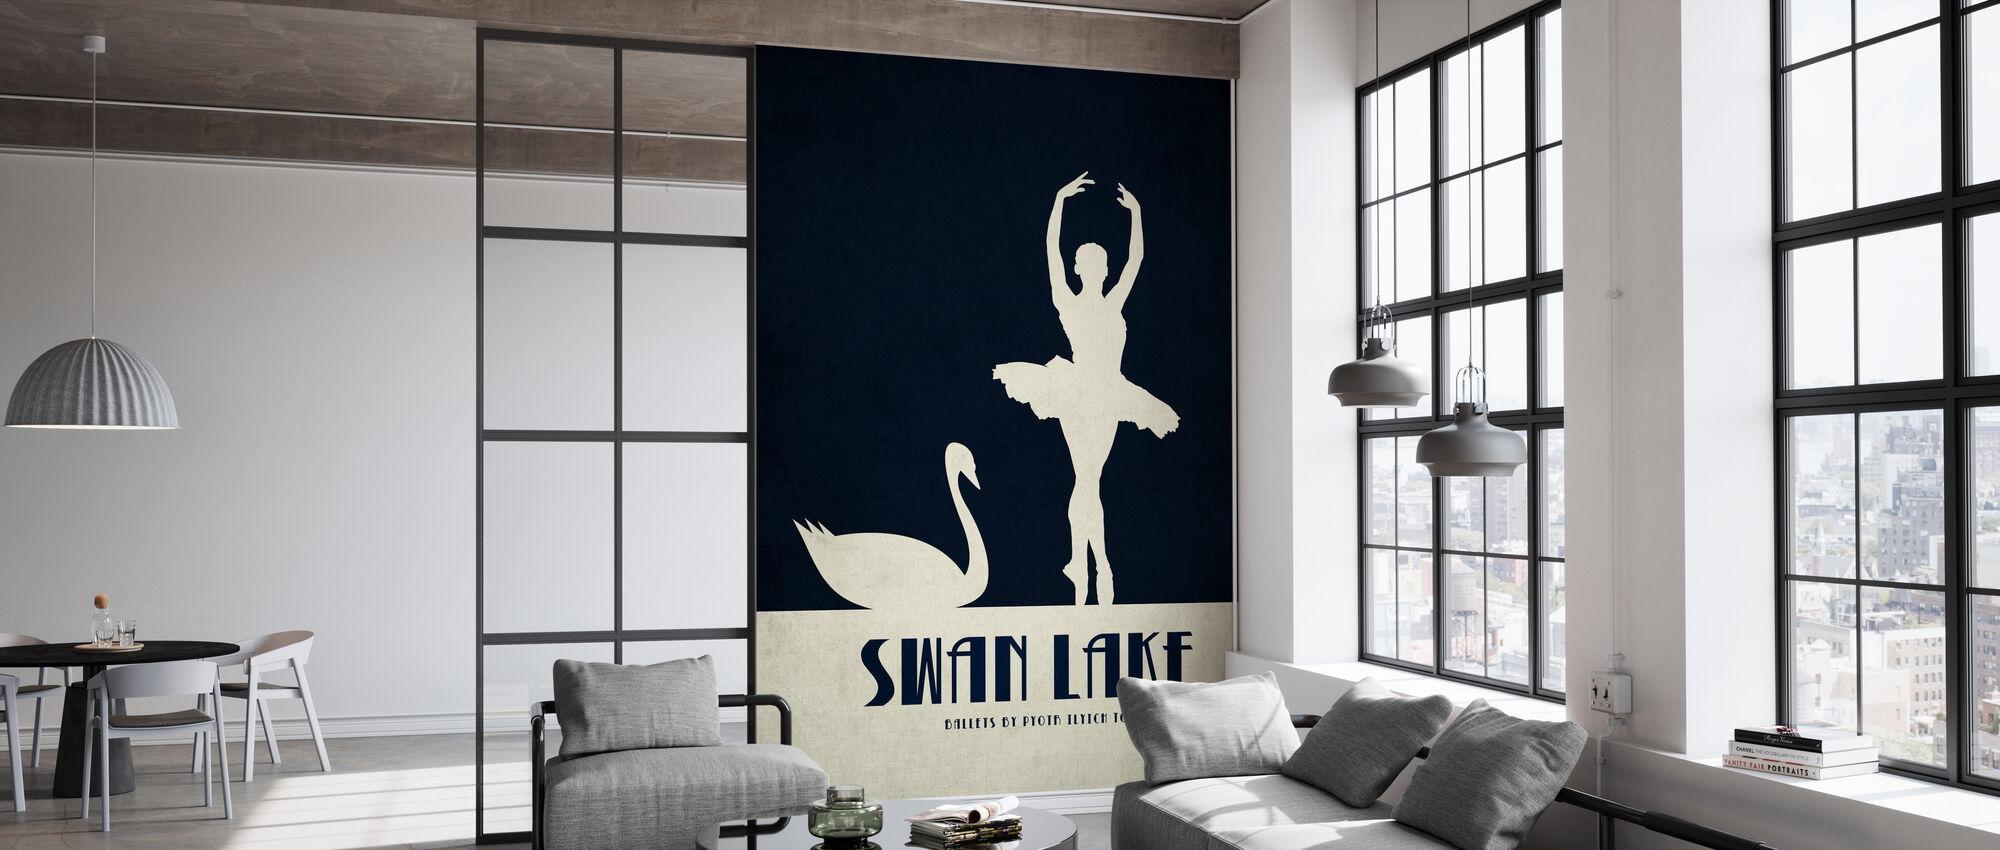 Swan Lake - Wallpaper - Office